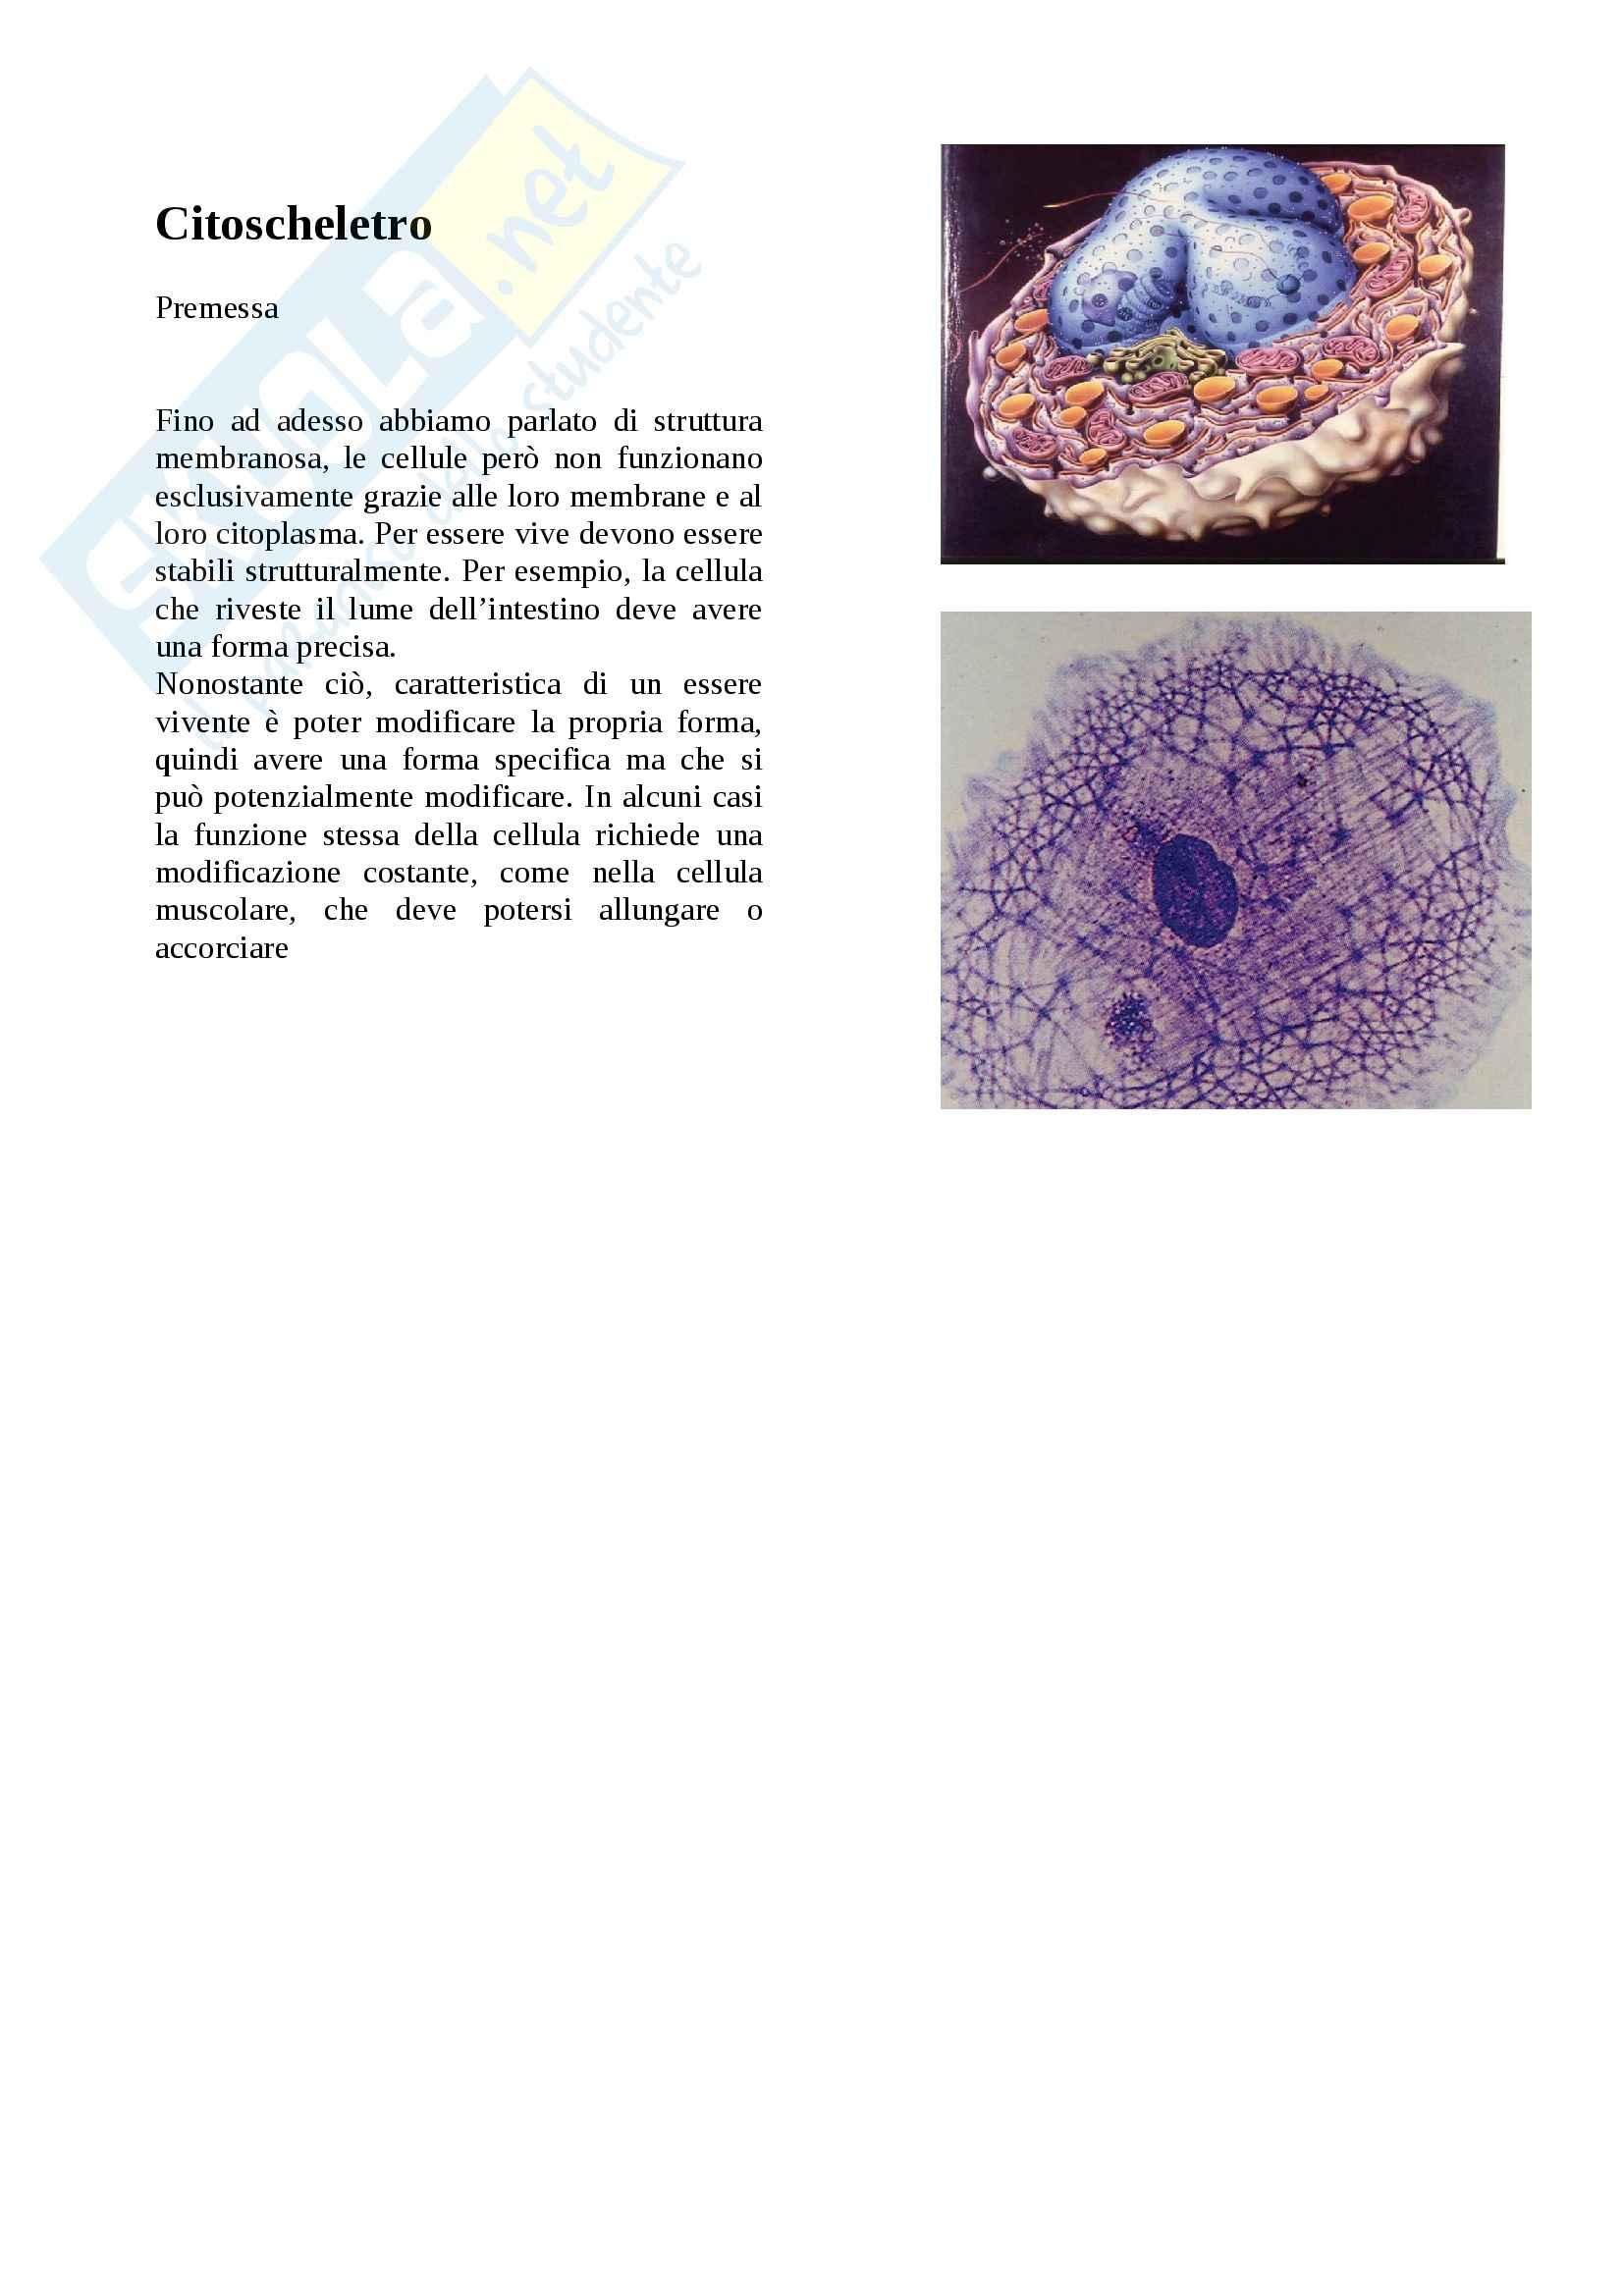 Citologia - citoscheletro e Microtubuli